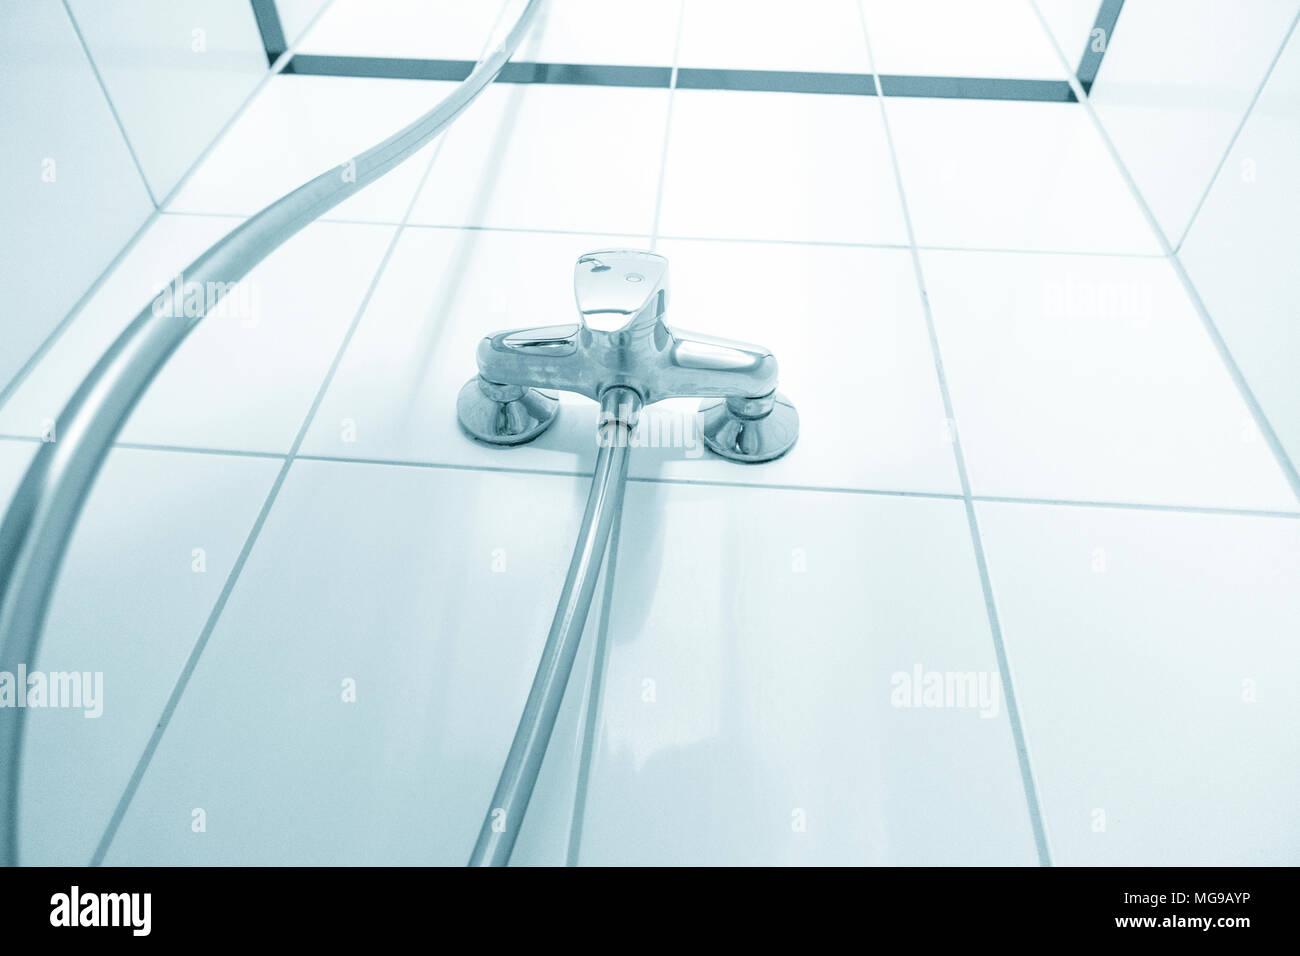 Shower mixer tap. - Stock Image